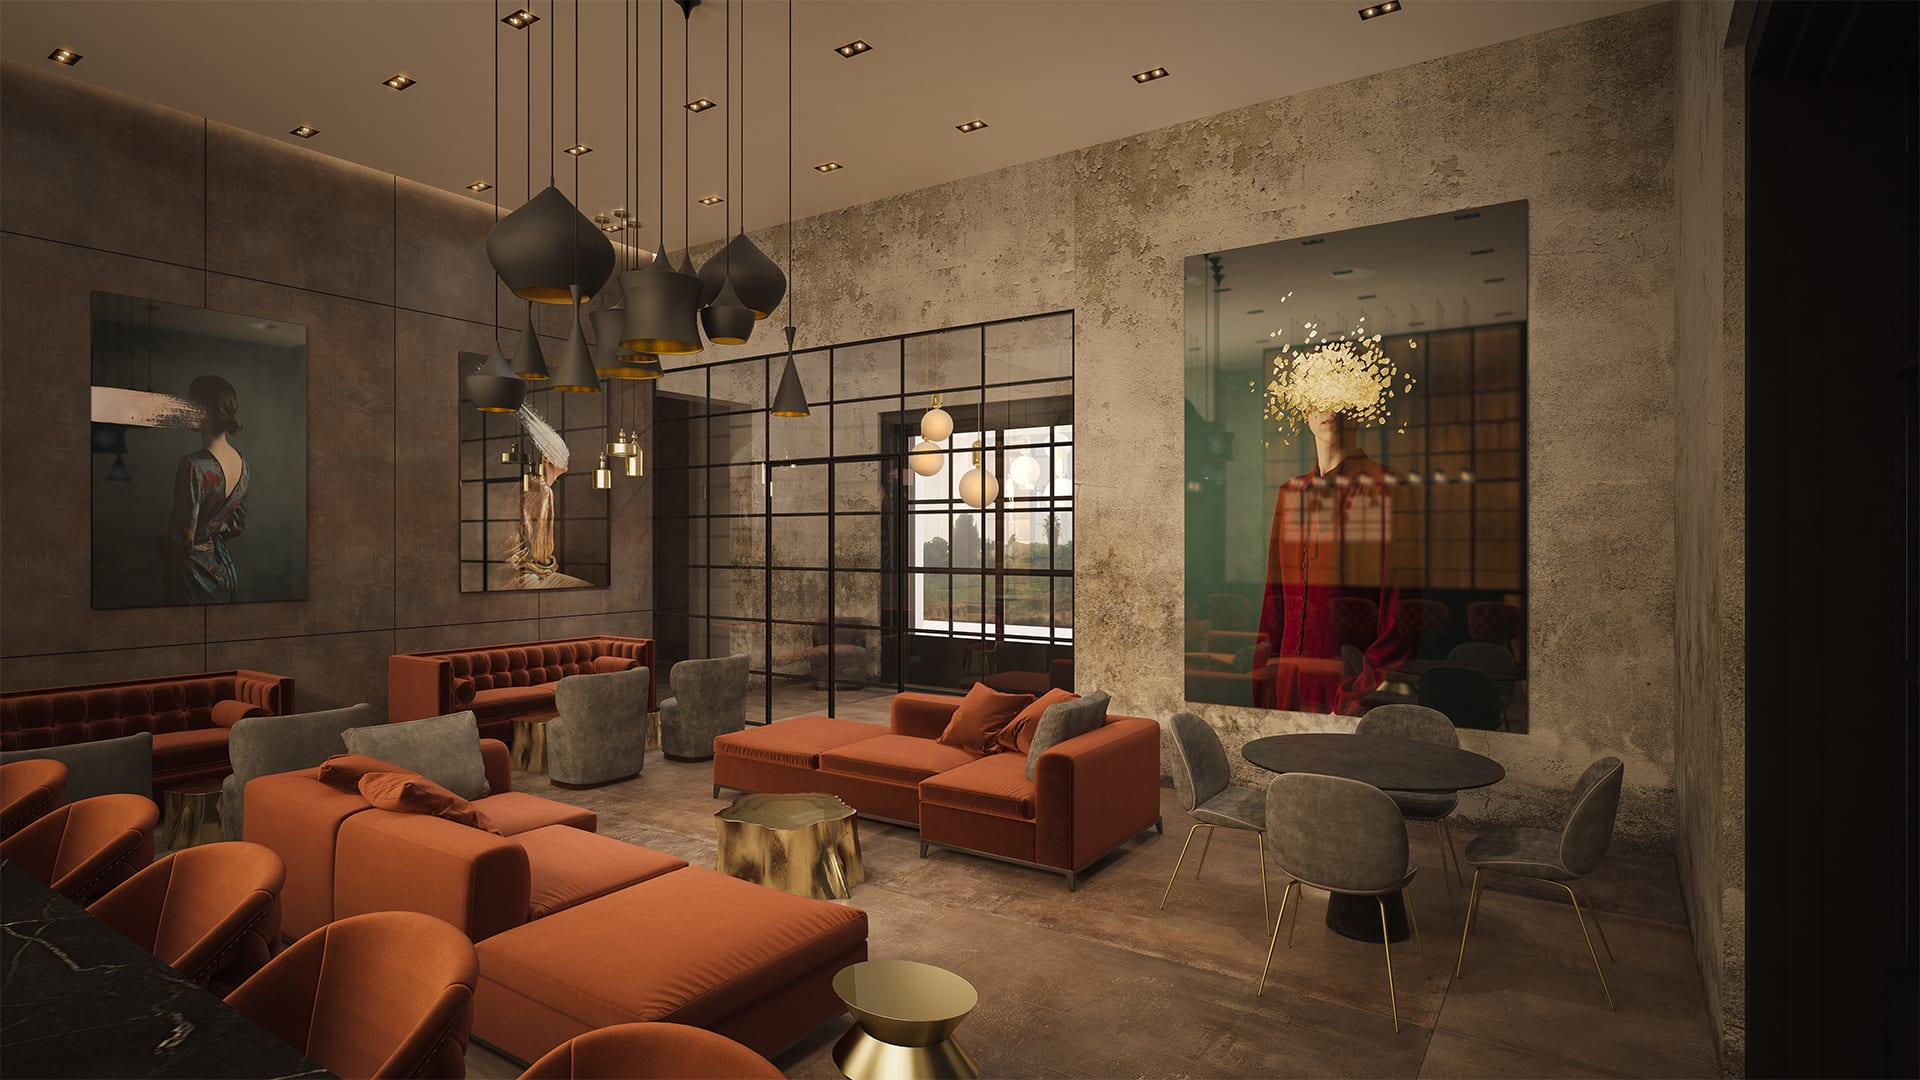 Maayan-Golan_Architectural-Visualization_interior-design-visualization_citrus-events_Coffee-bar_01